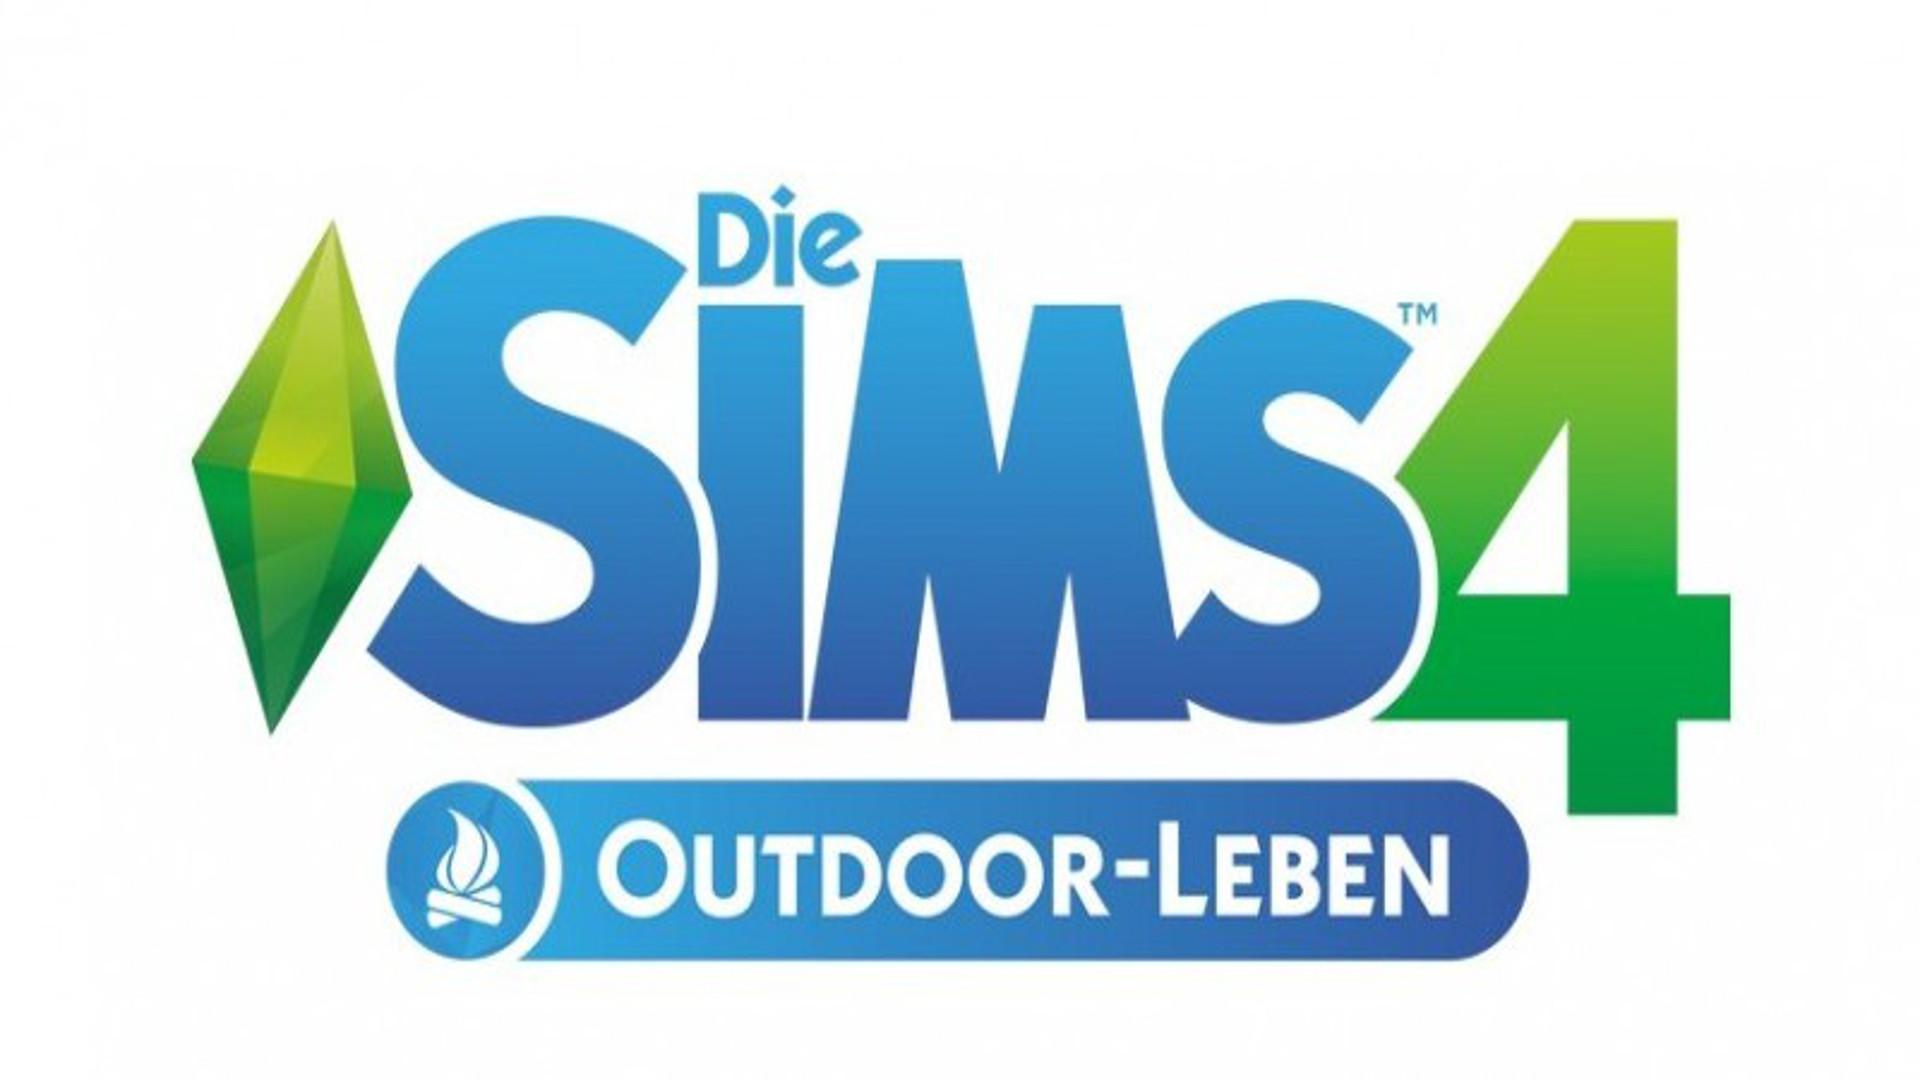 Die_Sims_4_Outdoor-Leben_Erstes_Gameplay_Pack_angekuendigt__1__20141219111506-pcgh_b2article_artwork